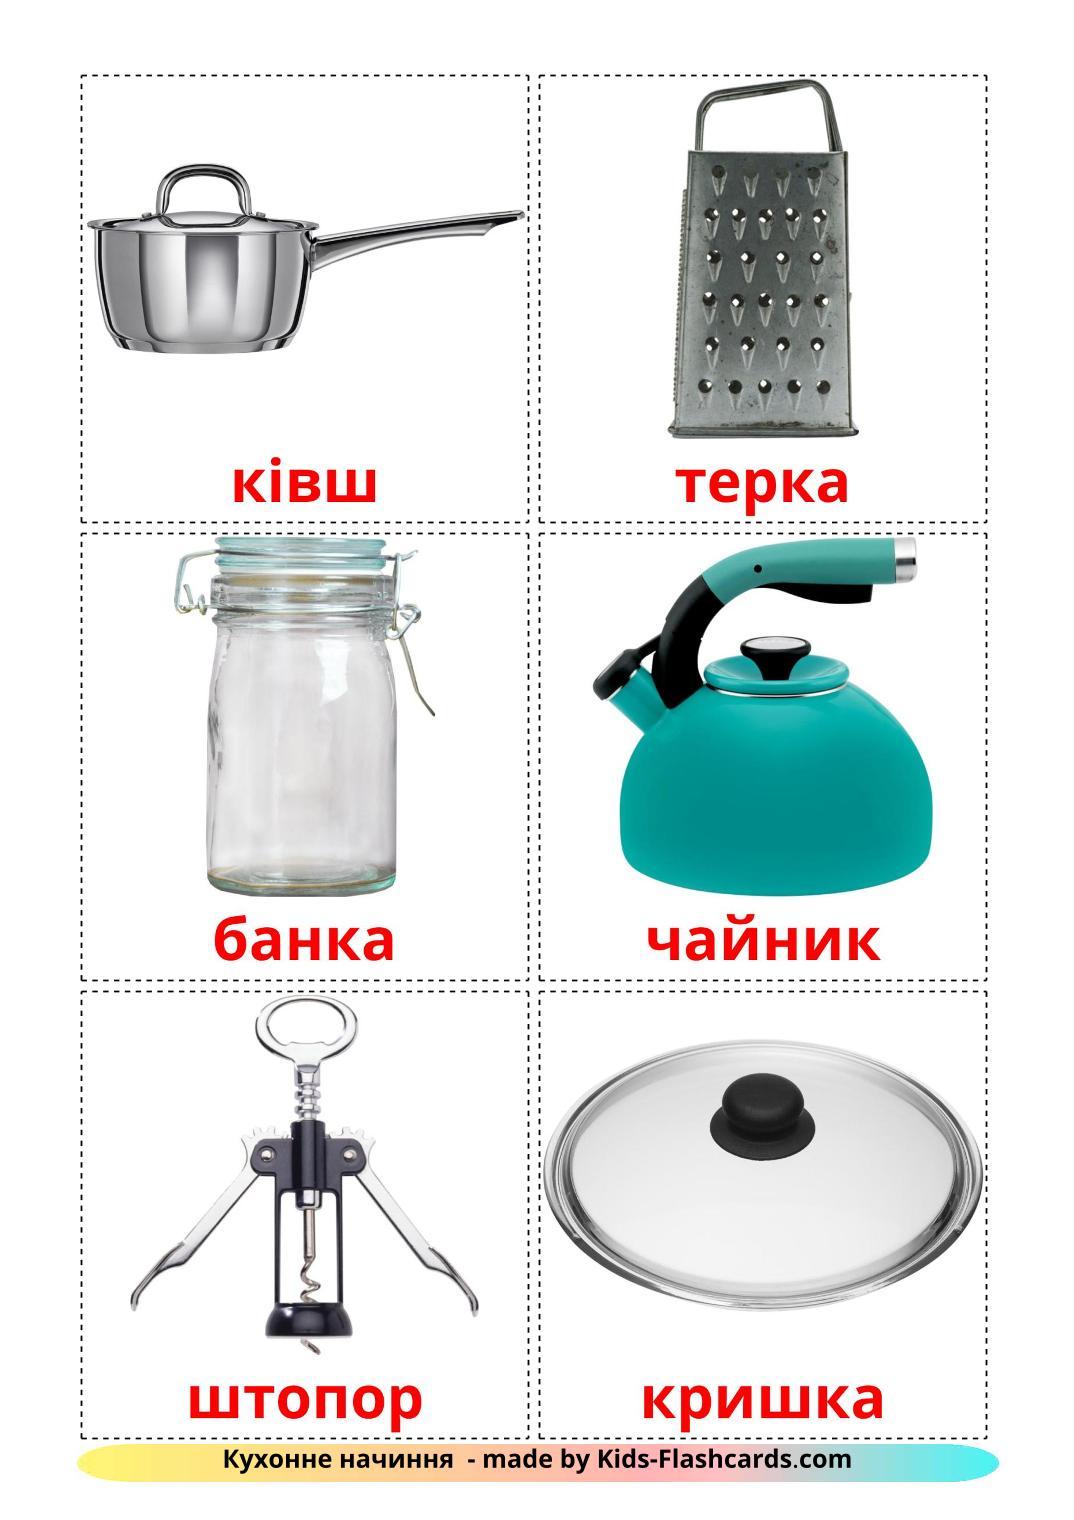 Kitchenware - 35 Free Printable ukrainian Flashcards